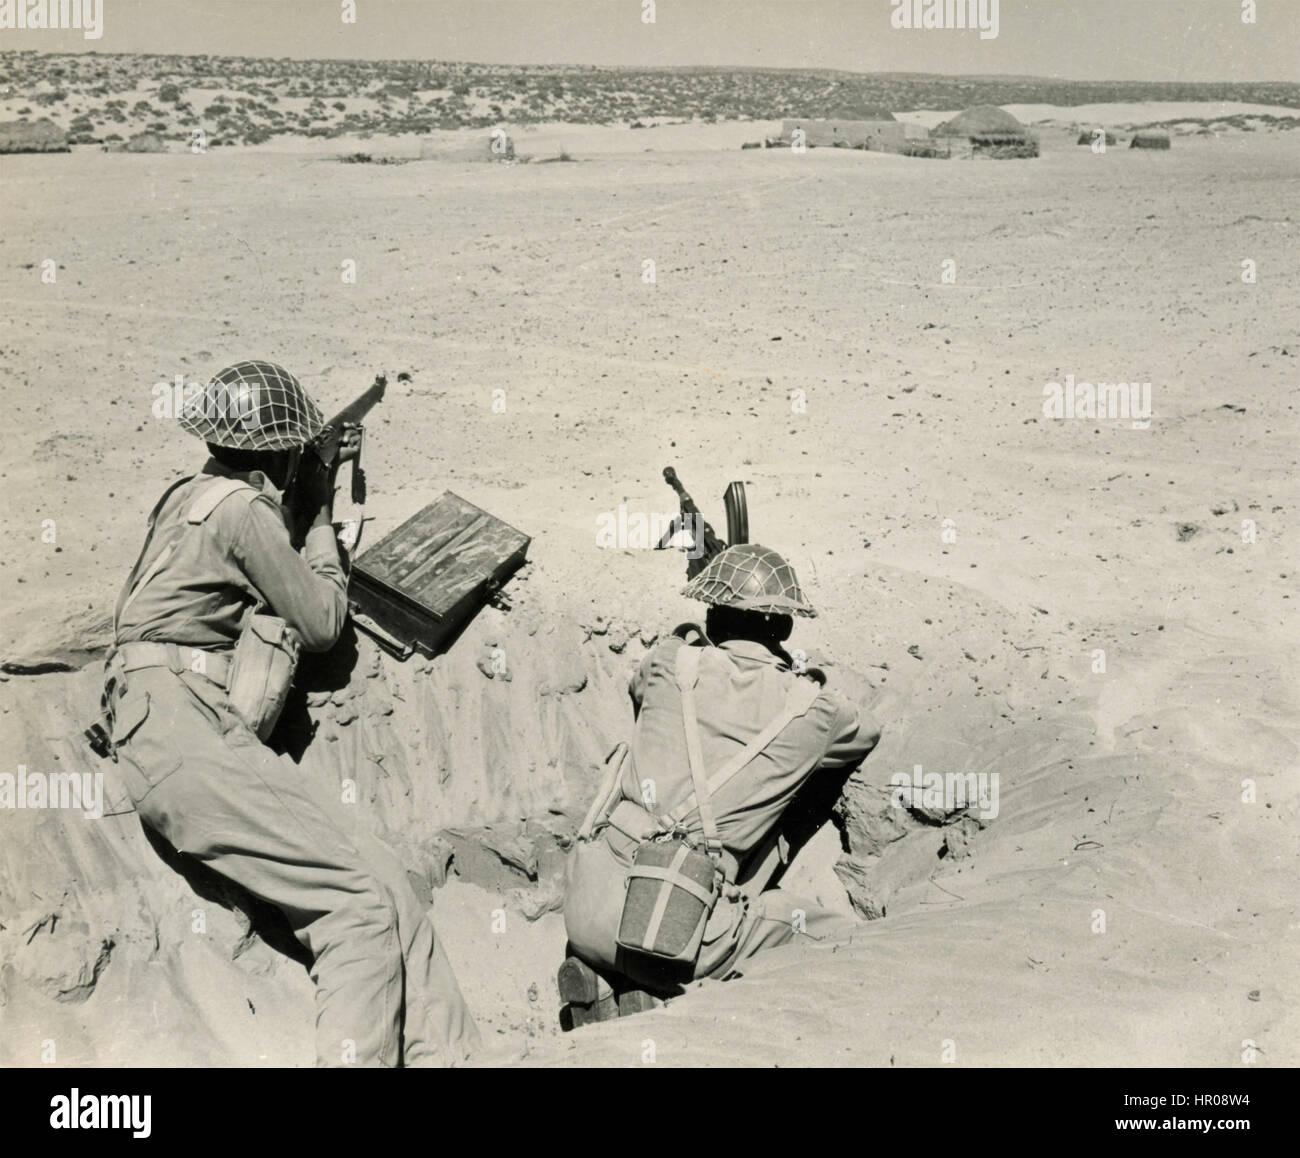 Los militares pakistaníes en Rajasthan, India 1965 Imagen De Stock